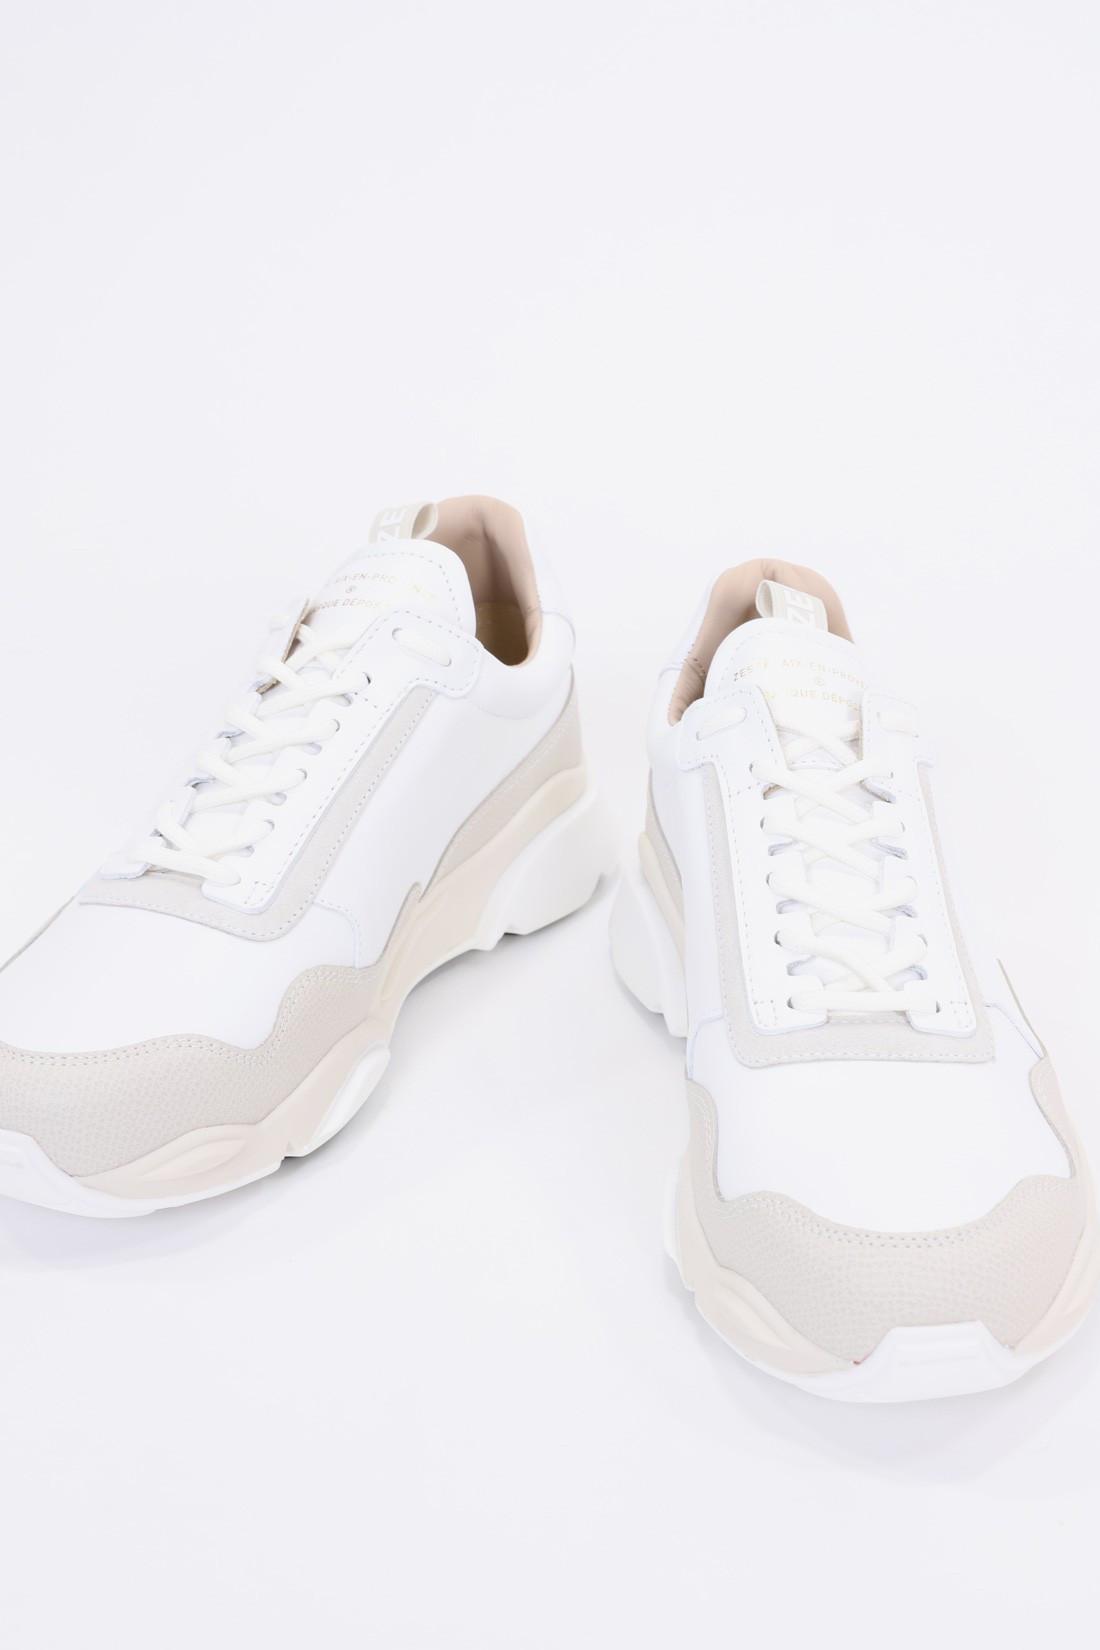 ZESPA FOR WOMAN / Zsp7 monochrome white White